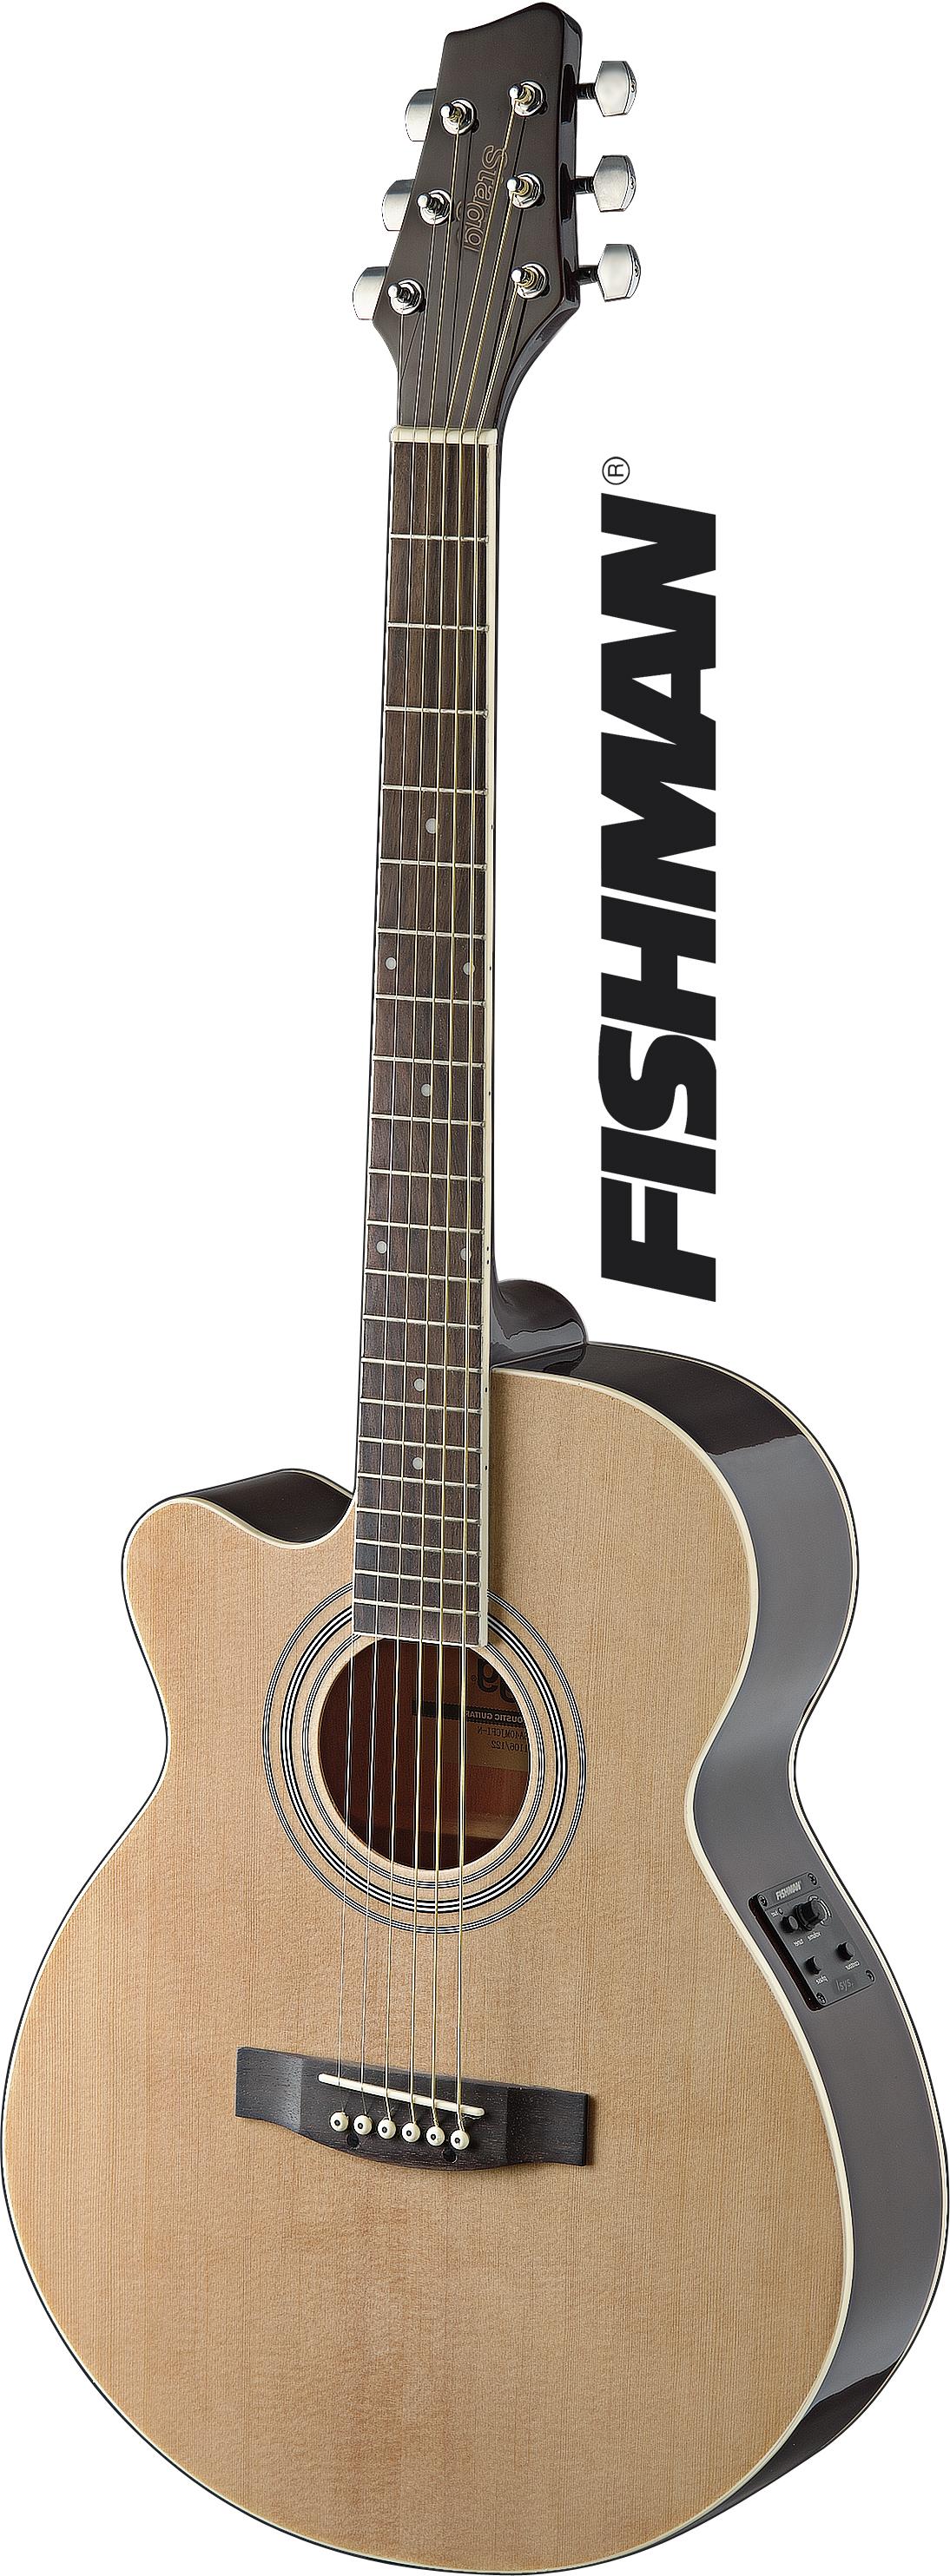 Stagg SA40MJCFI-LH N, elektroakustická kytara typu Mini Jumbo, levoruká